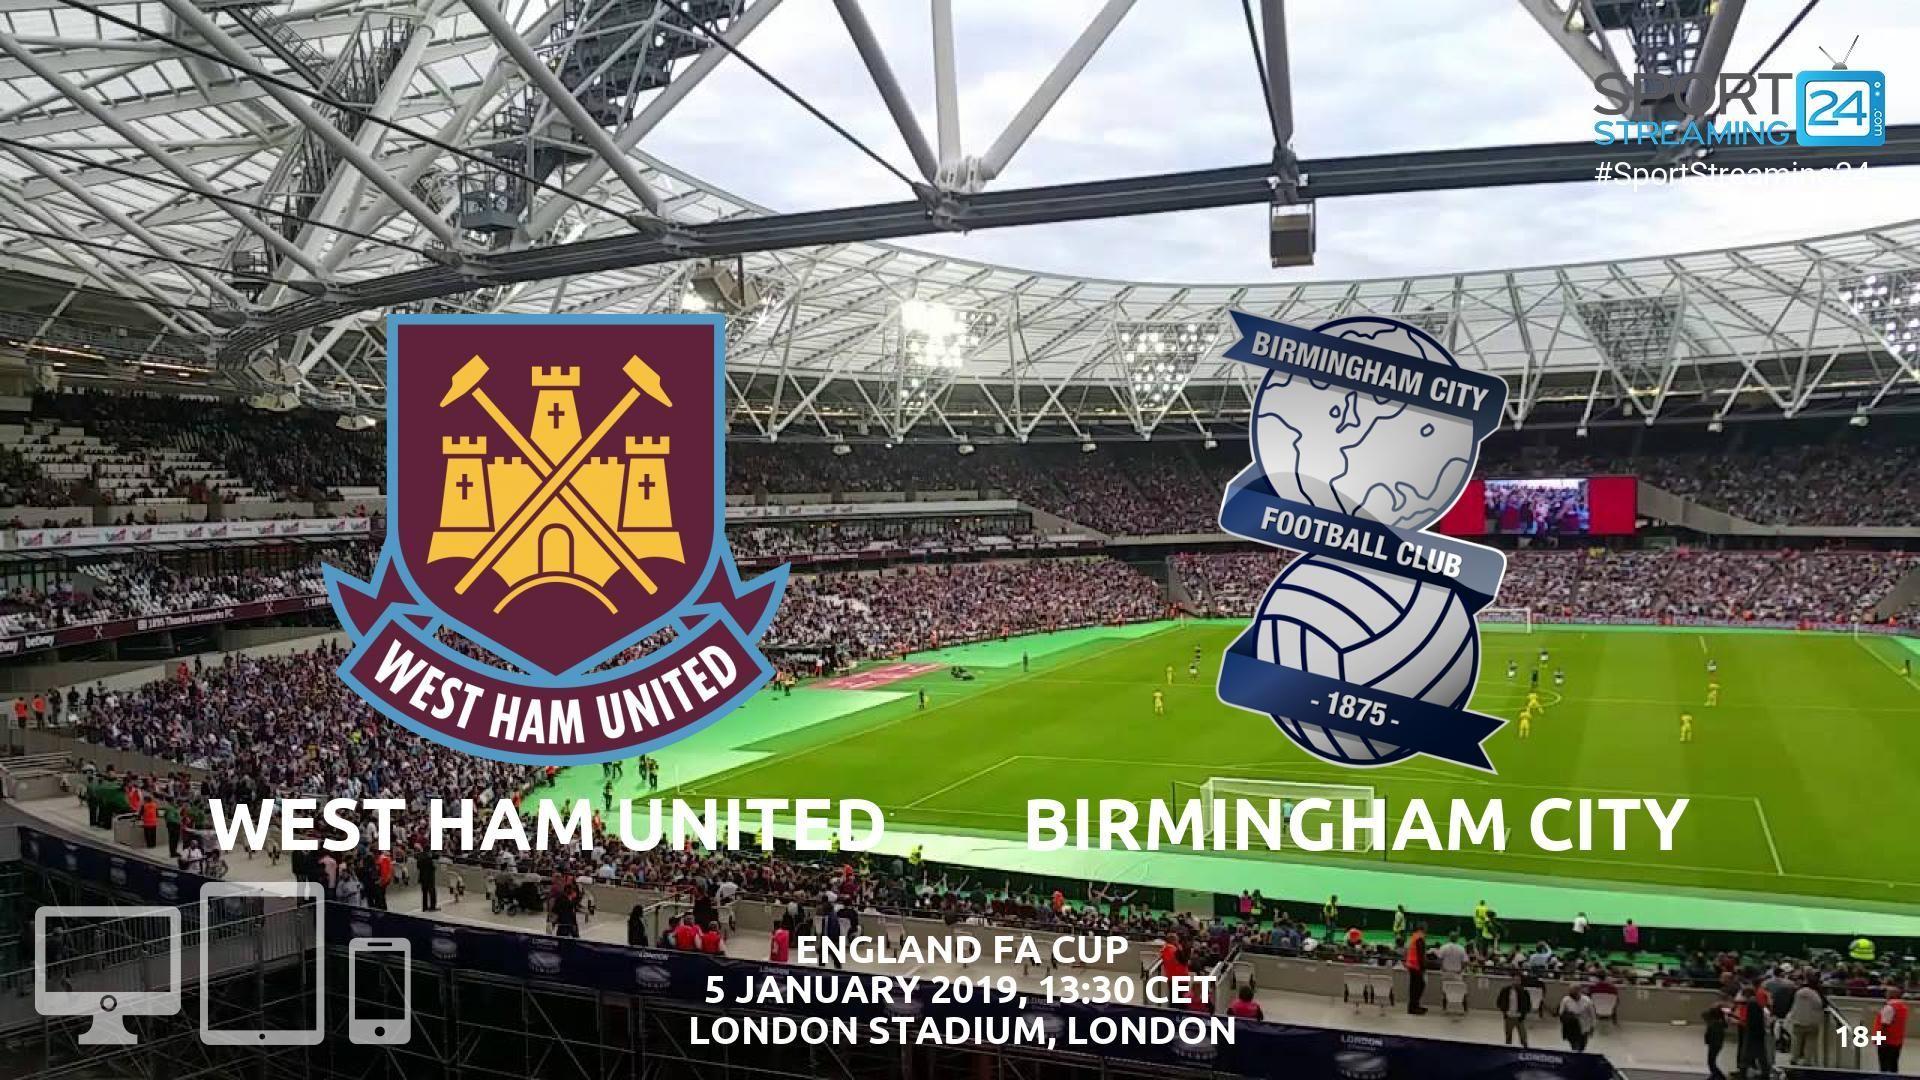 Streaming News And Match Previews Sportstreaming24 Birmingham City Birmingham England Fa